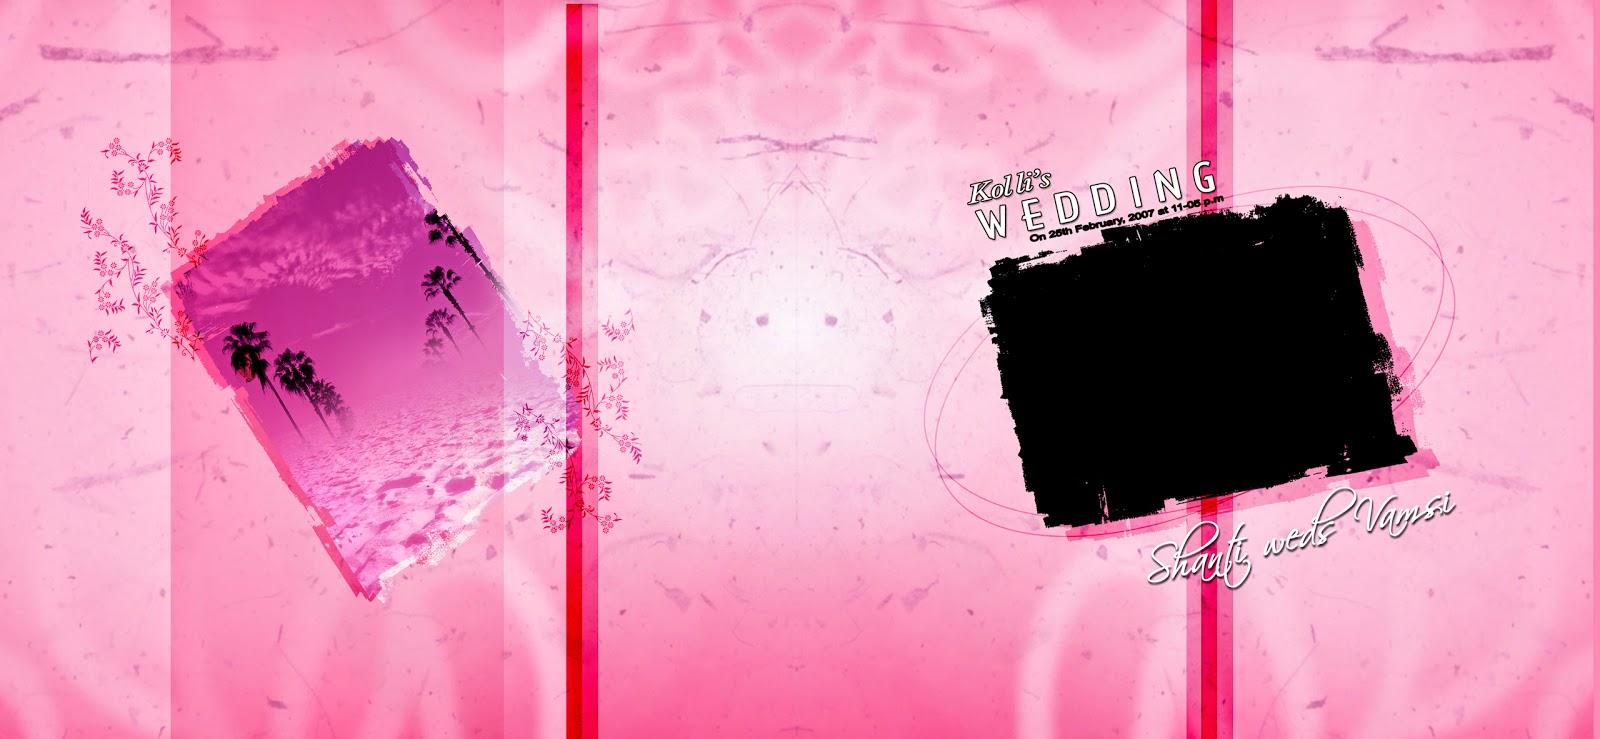 Wedding Psd Backgrounds Free Download Joy Studio Design